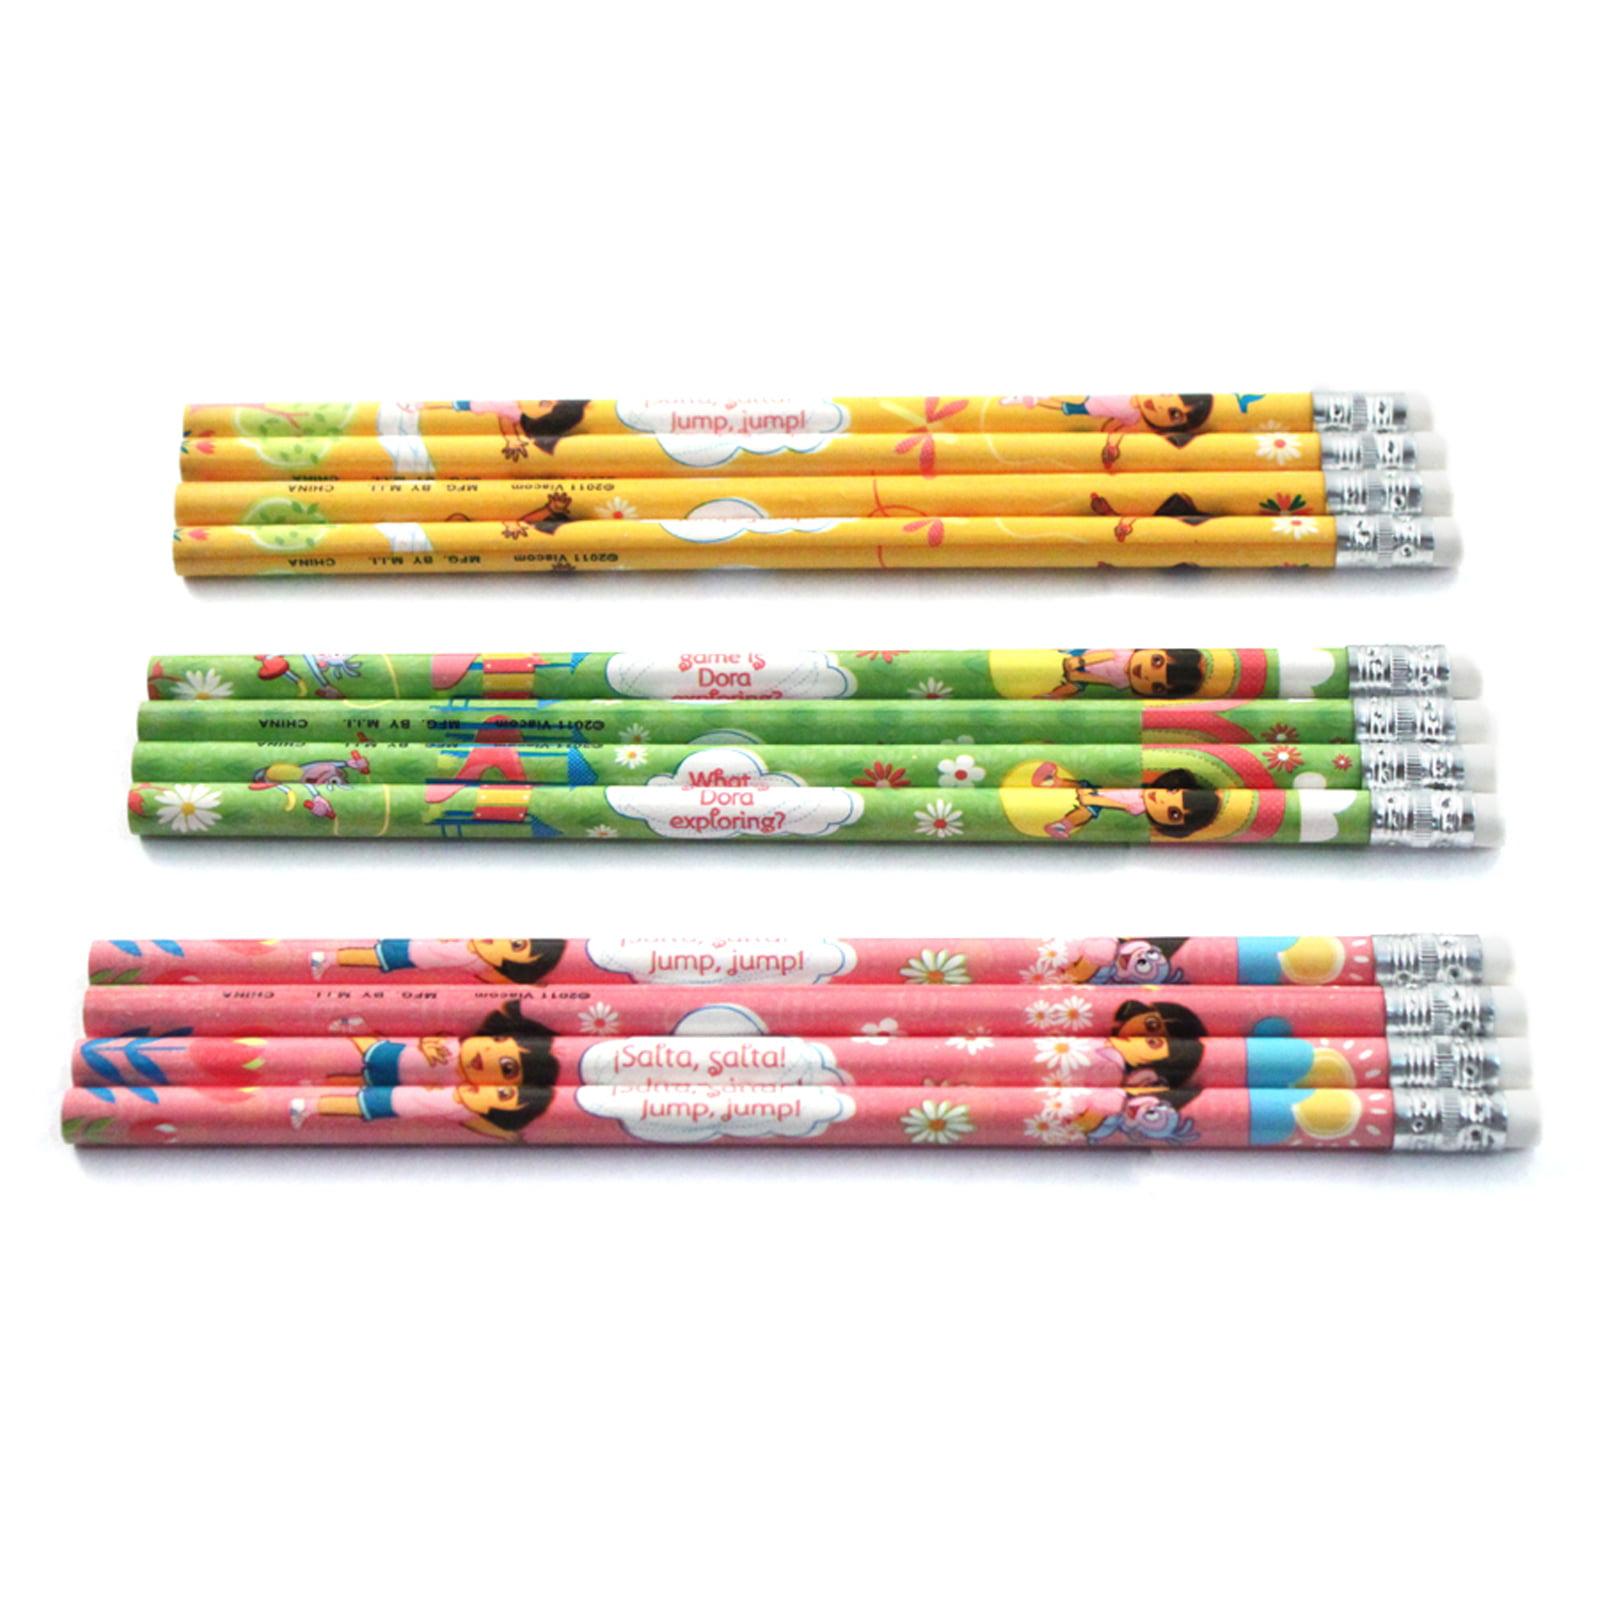 Nick Jr. Dora The Explorer Kids Number 2 Pencils 12 Pack by Nickelodeon